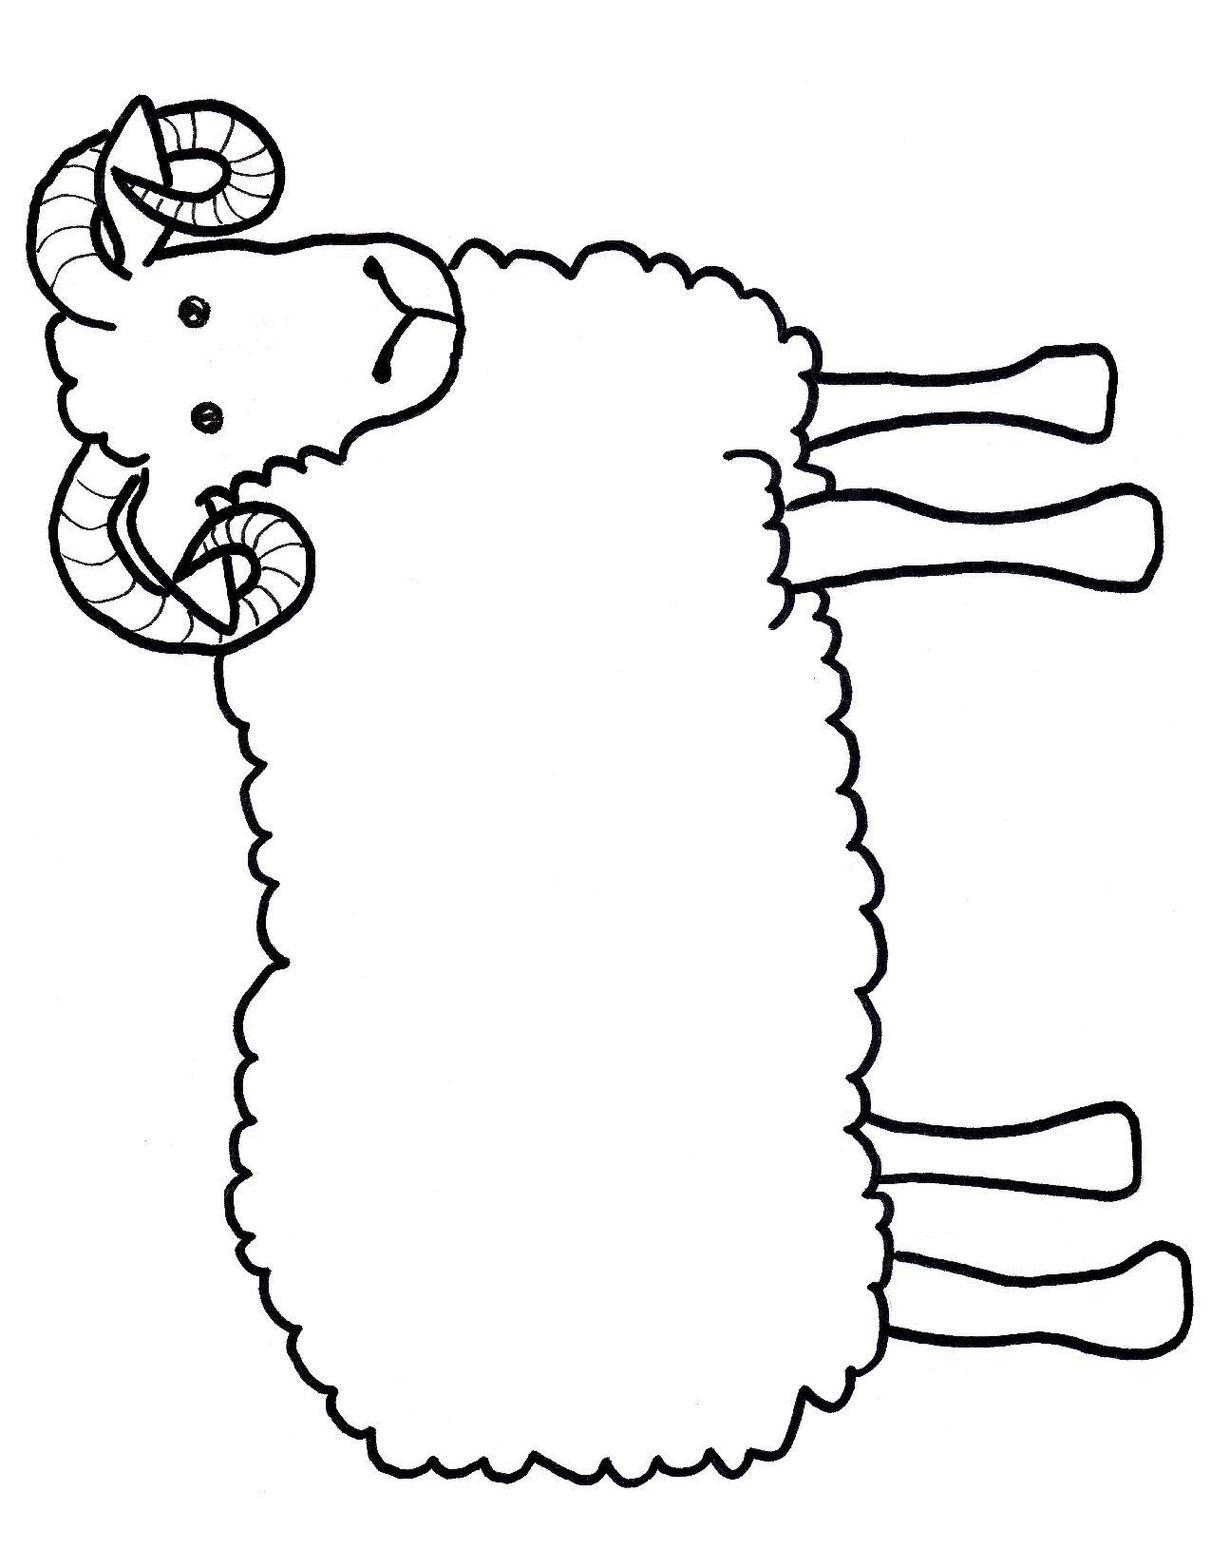 clip art Ram clipart black and white. Free cliparts download clip.